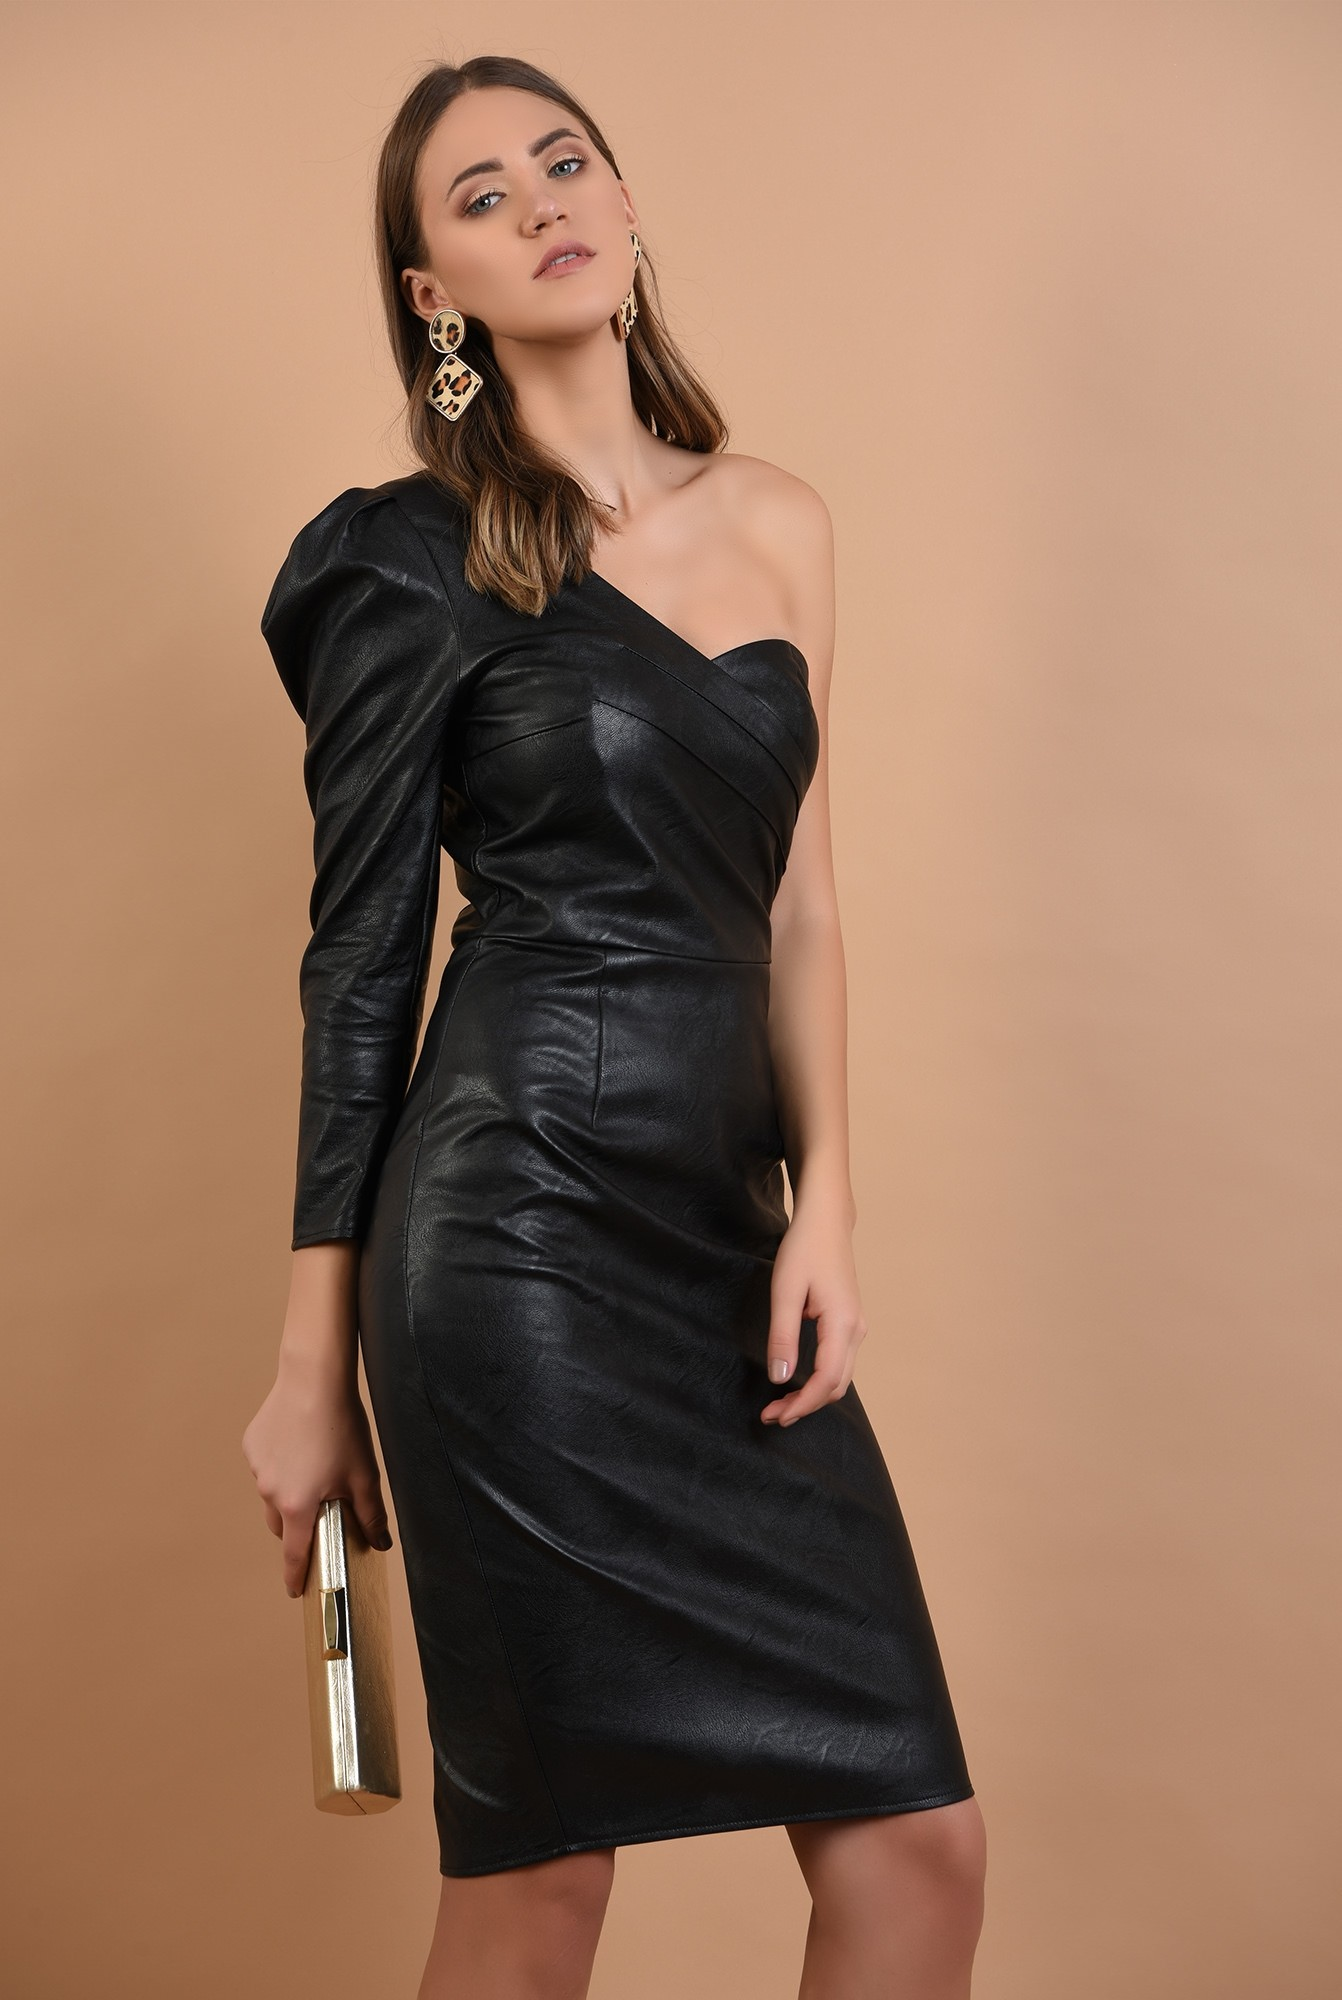 0 - rochie eleganta, piele neagra, maneca drapata, umar gol